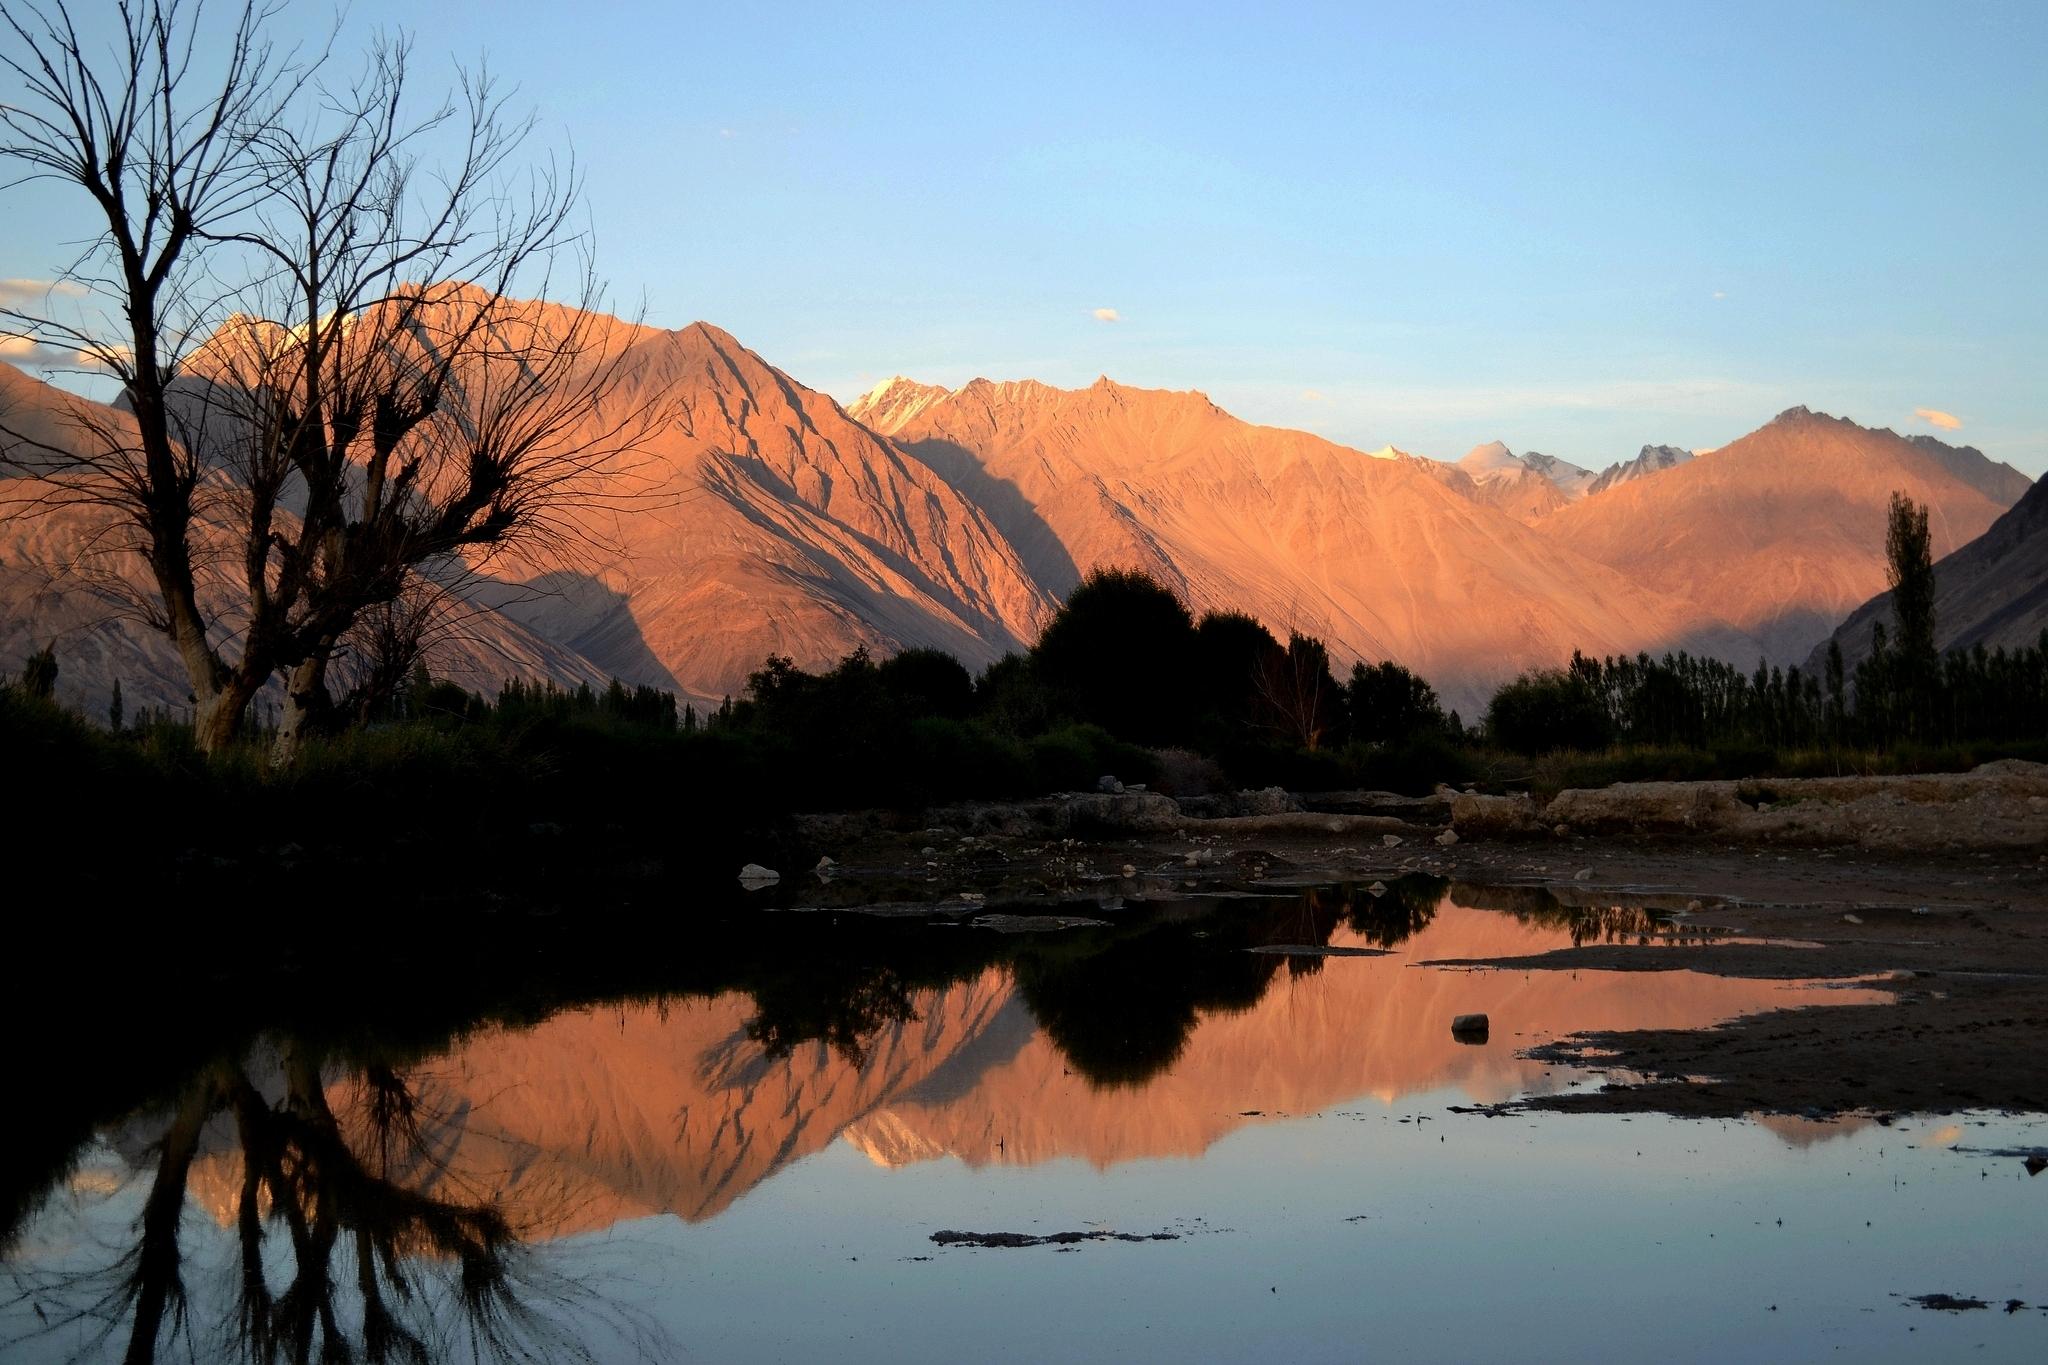 Sunset in Nubra Valley, India